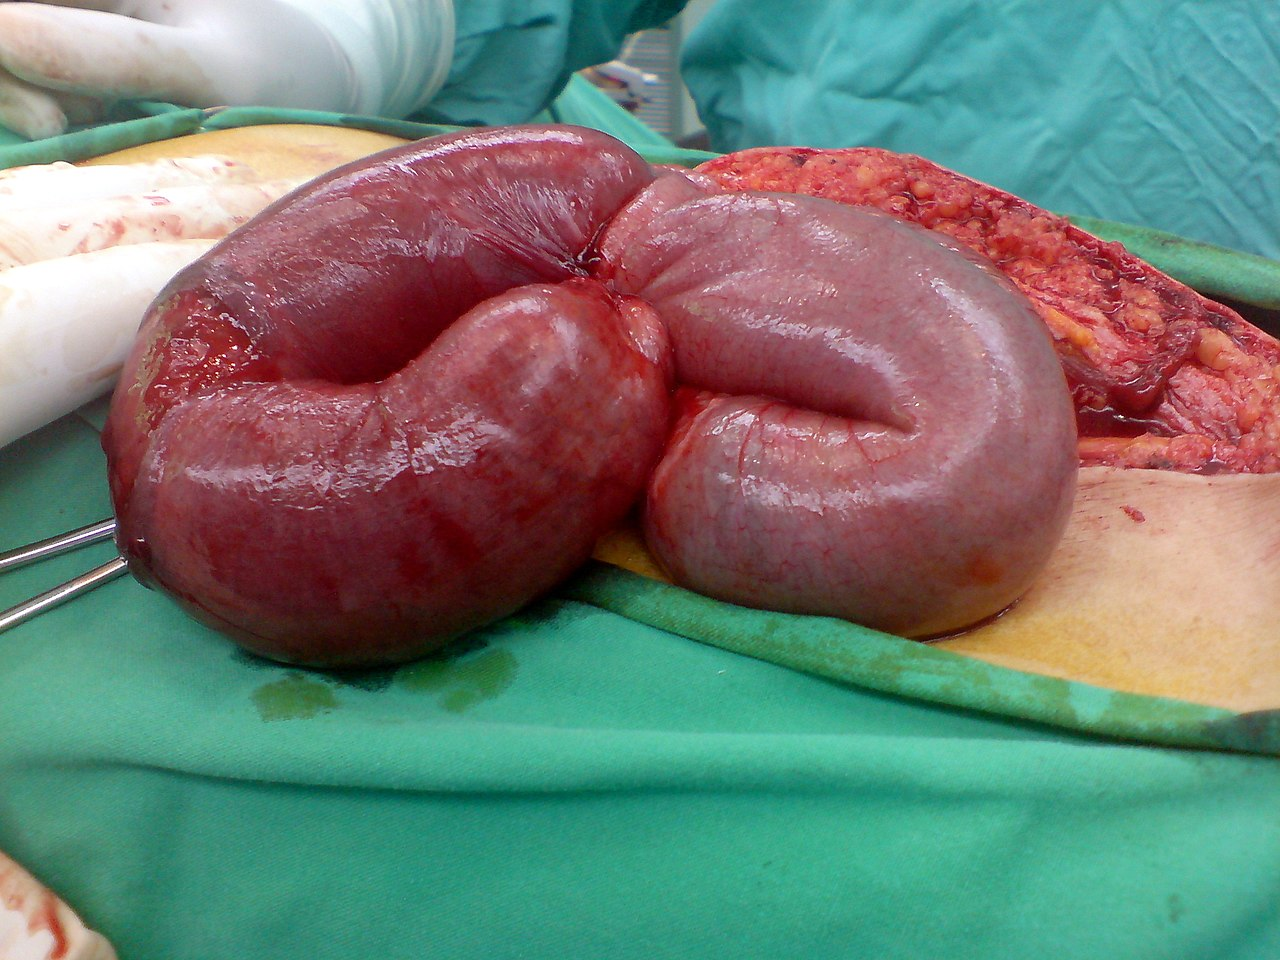 Dog Intestinal Blockage Surgery Cost Uk